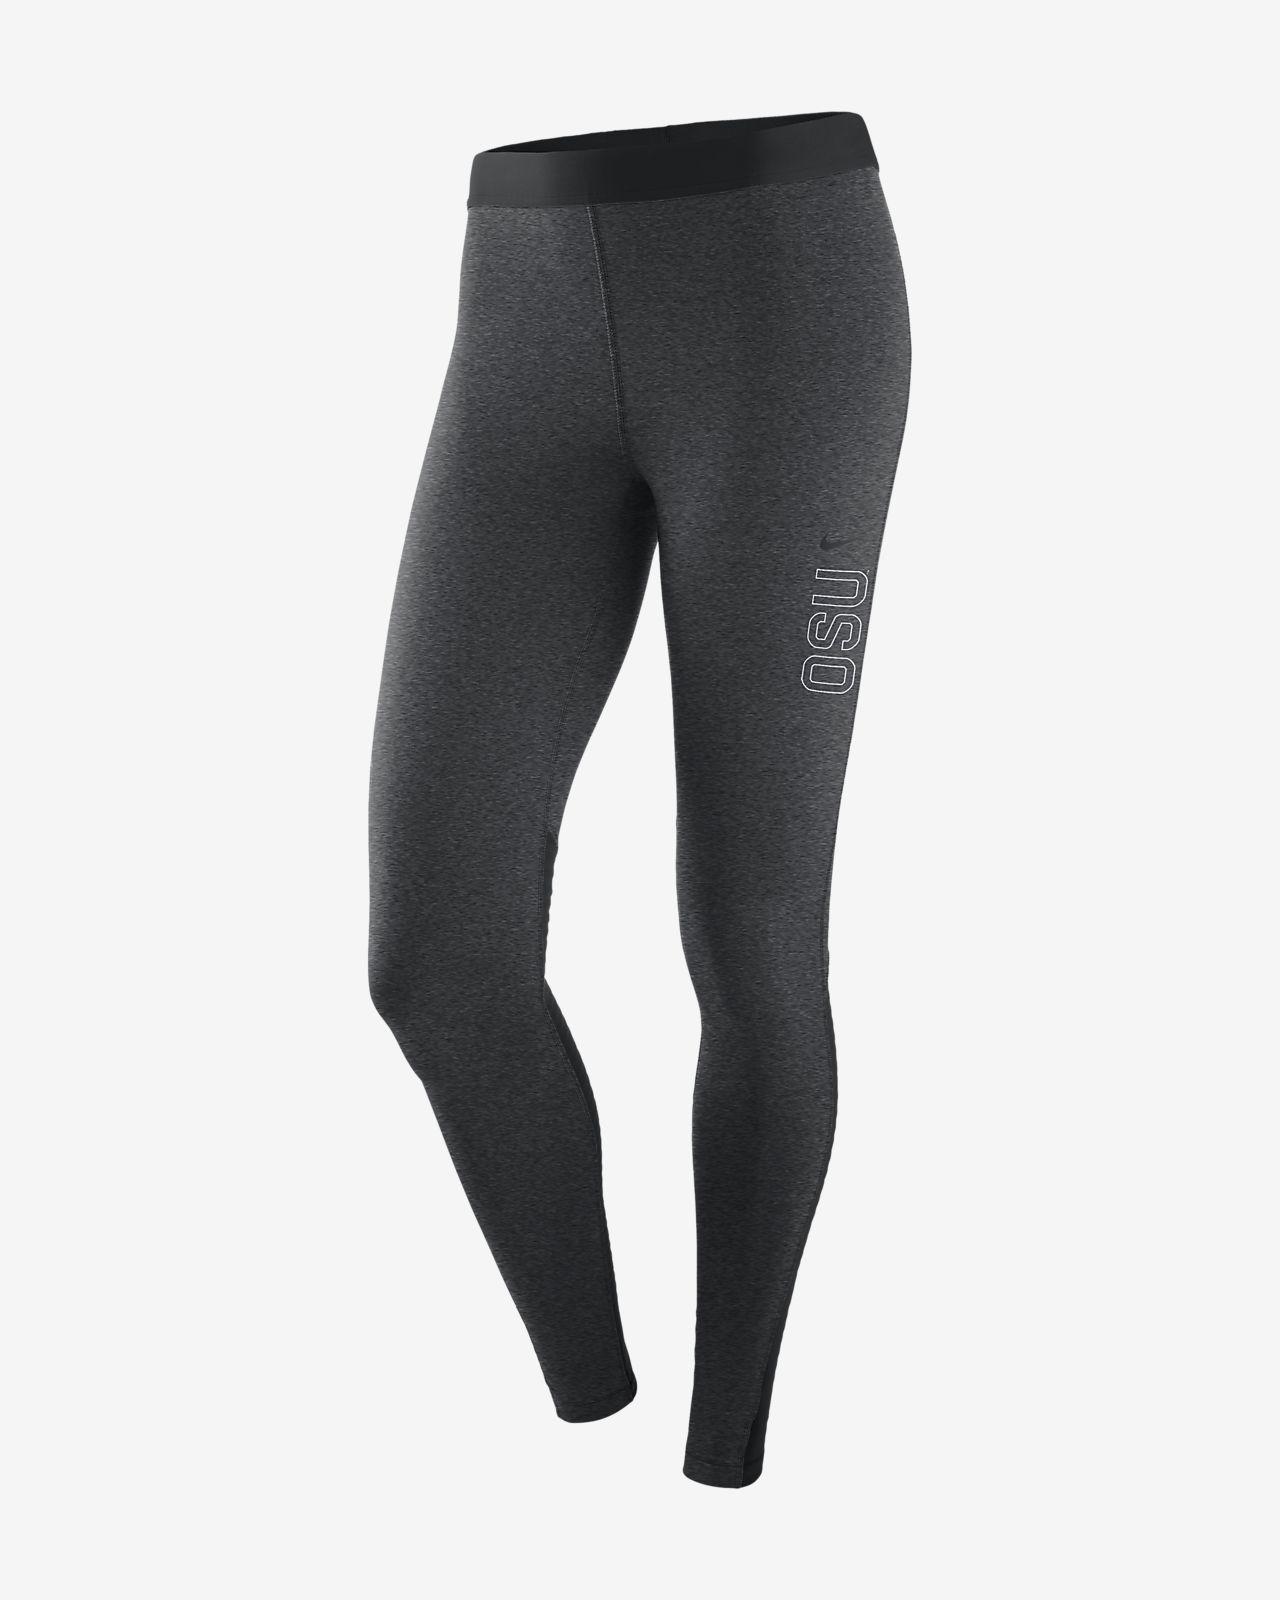 Nike College Pro Warm (Ohio State) Women's Tights